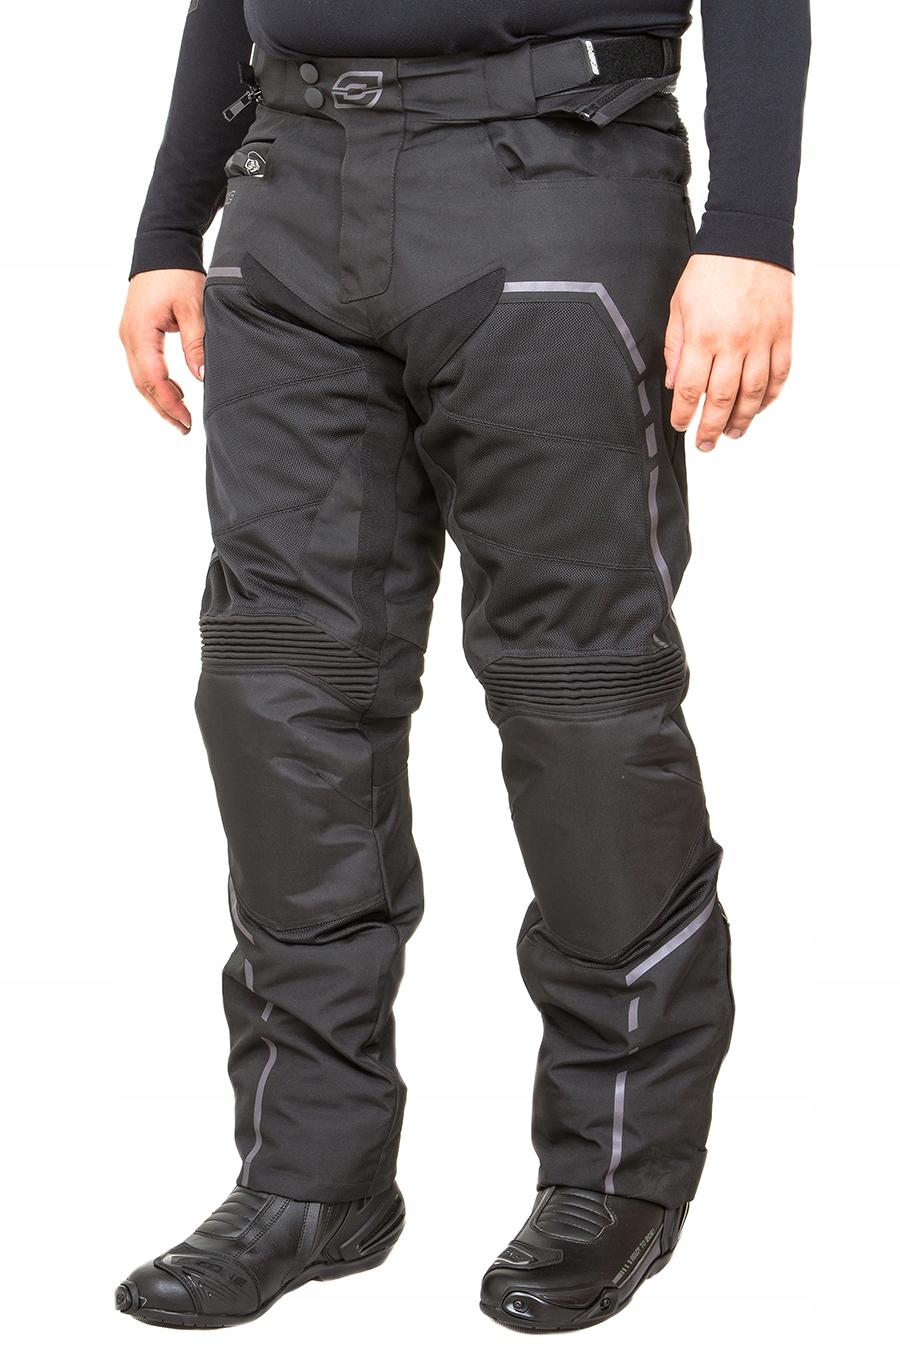 Tesktylne штаны мотоциклетные ozone jet 5xl, фото 3